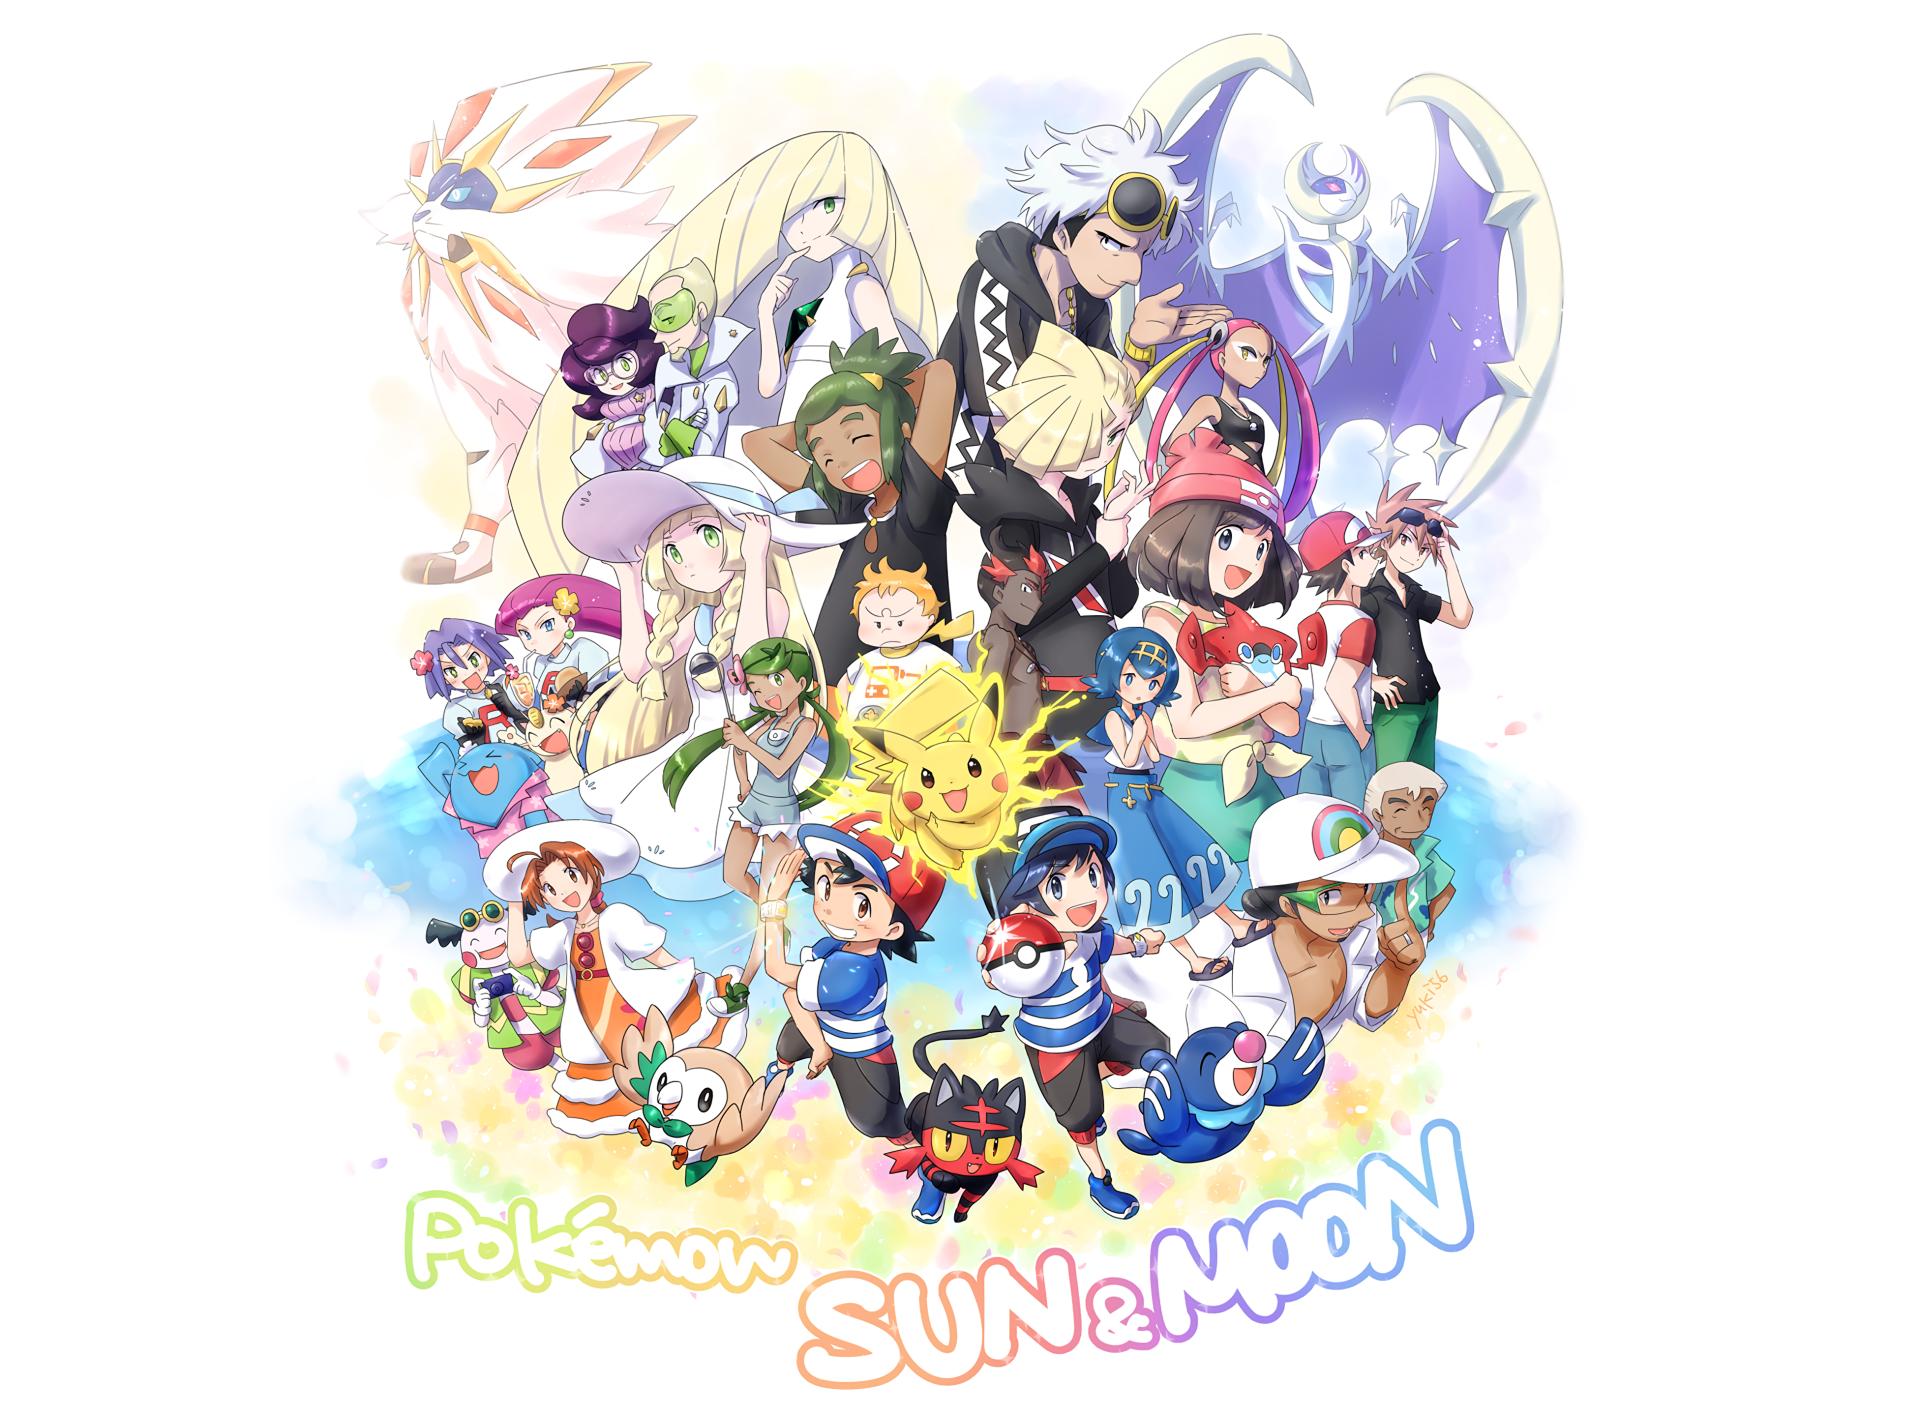 Pokémon 4k Ultra Fond d'écran HD | Arrière-Plan | 3904x2880 | ID:773345 - Wallpaper Abyss